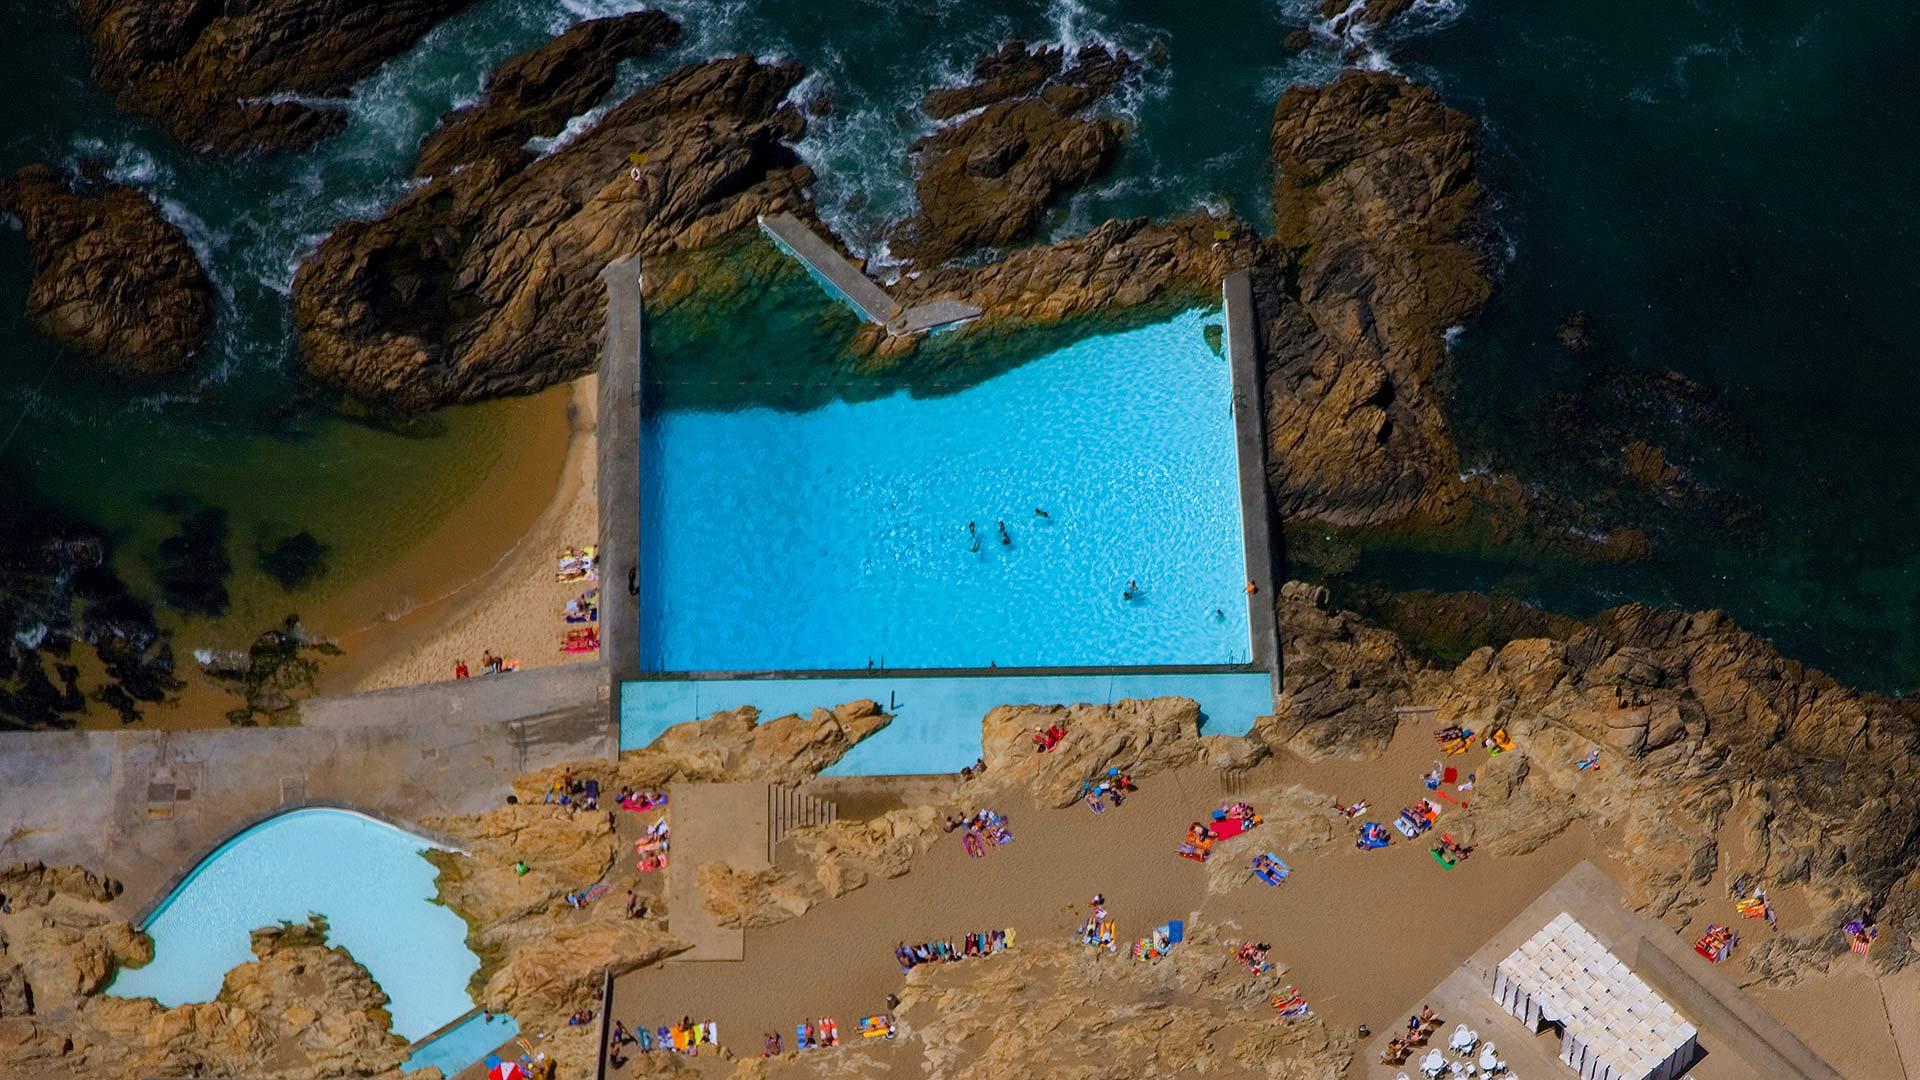 Tidal pools of Leça da Palmeira, Portugal (© Fernando Guerra/age fotostock)(Bing United States)